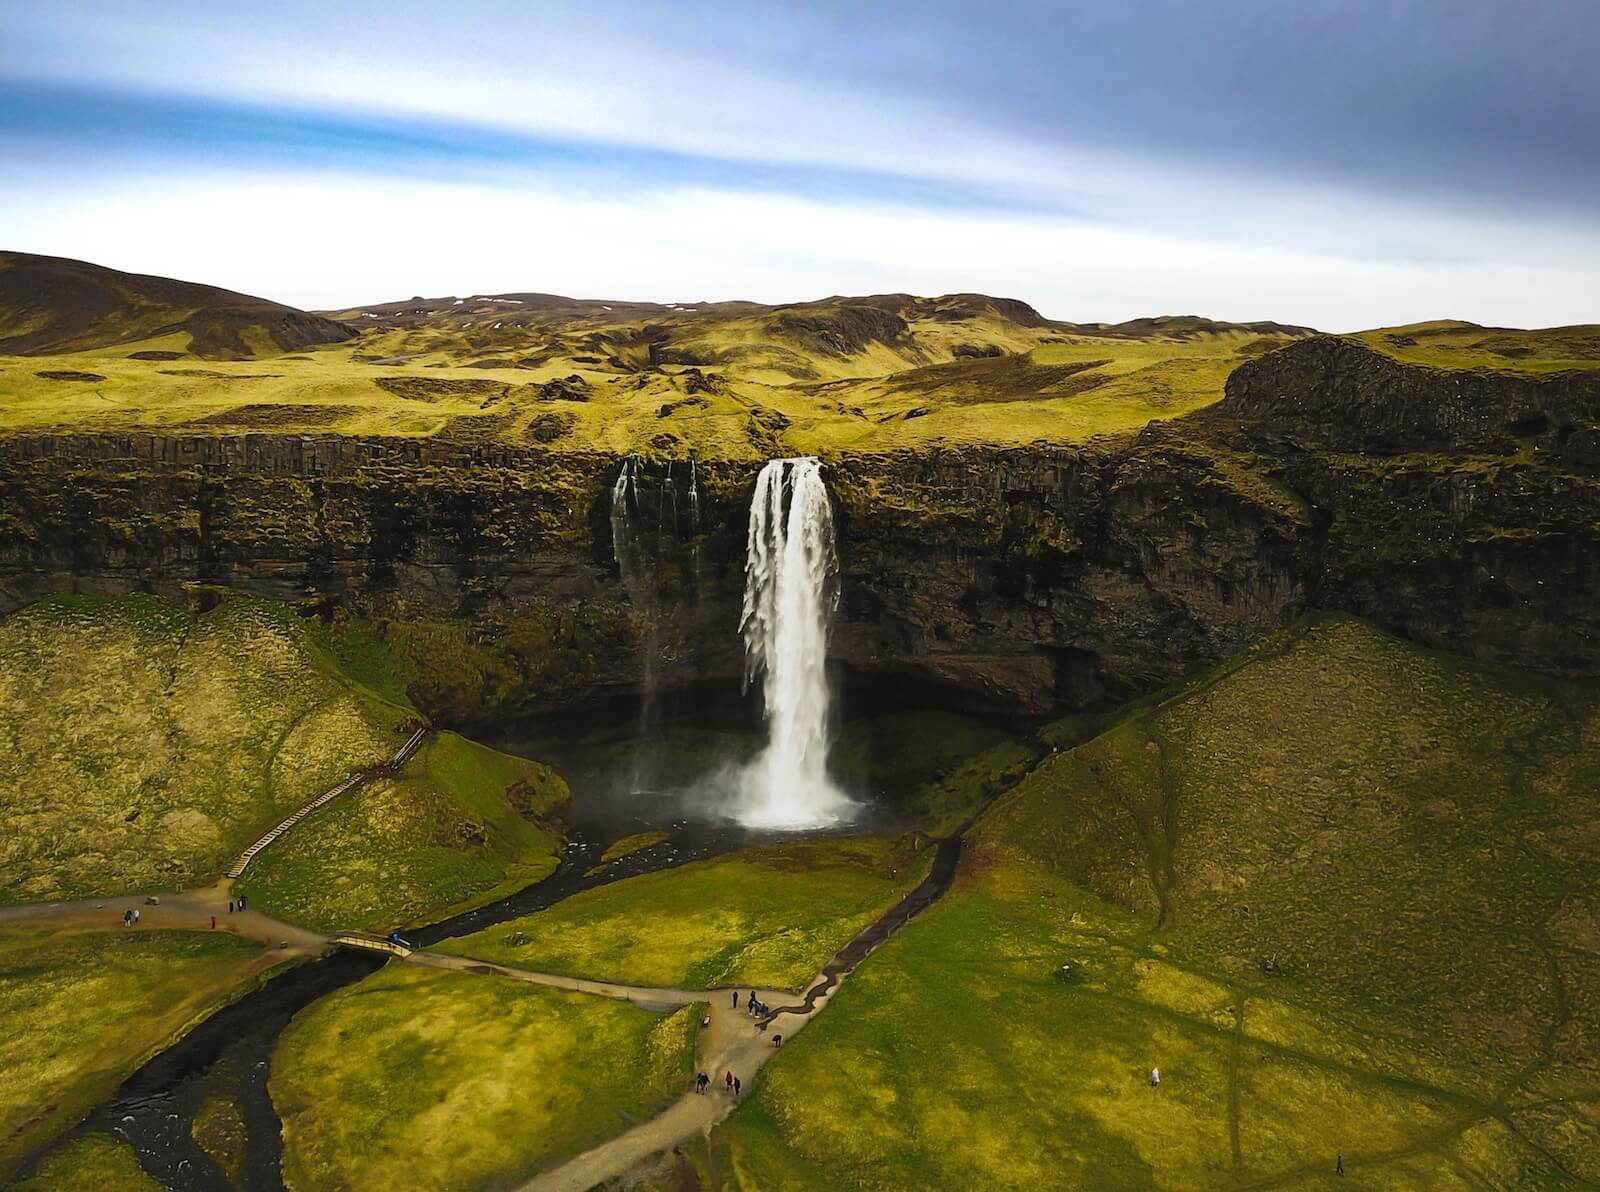 beste reistijd ijsland juli t/m september